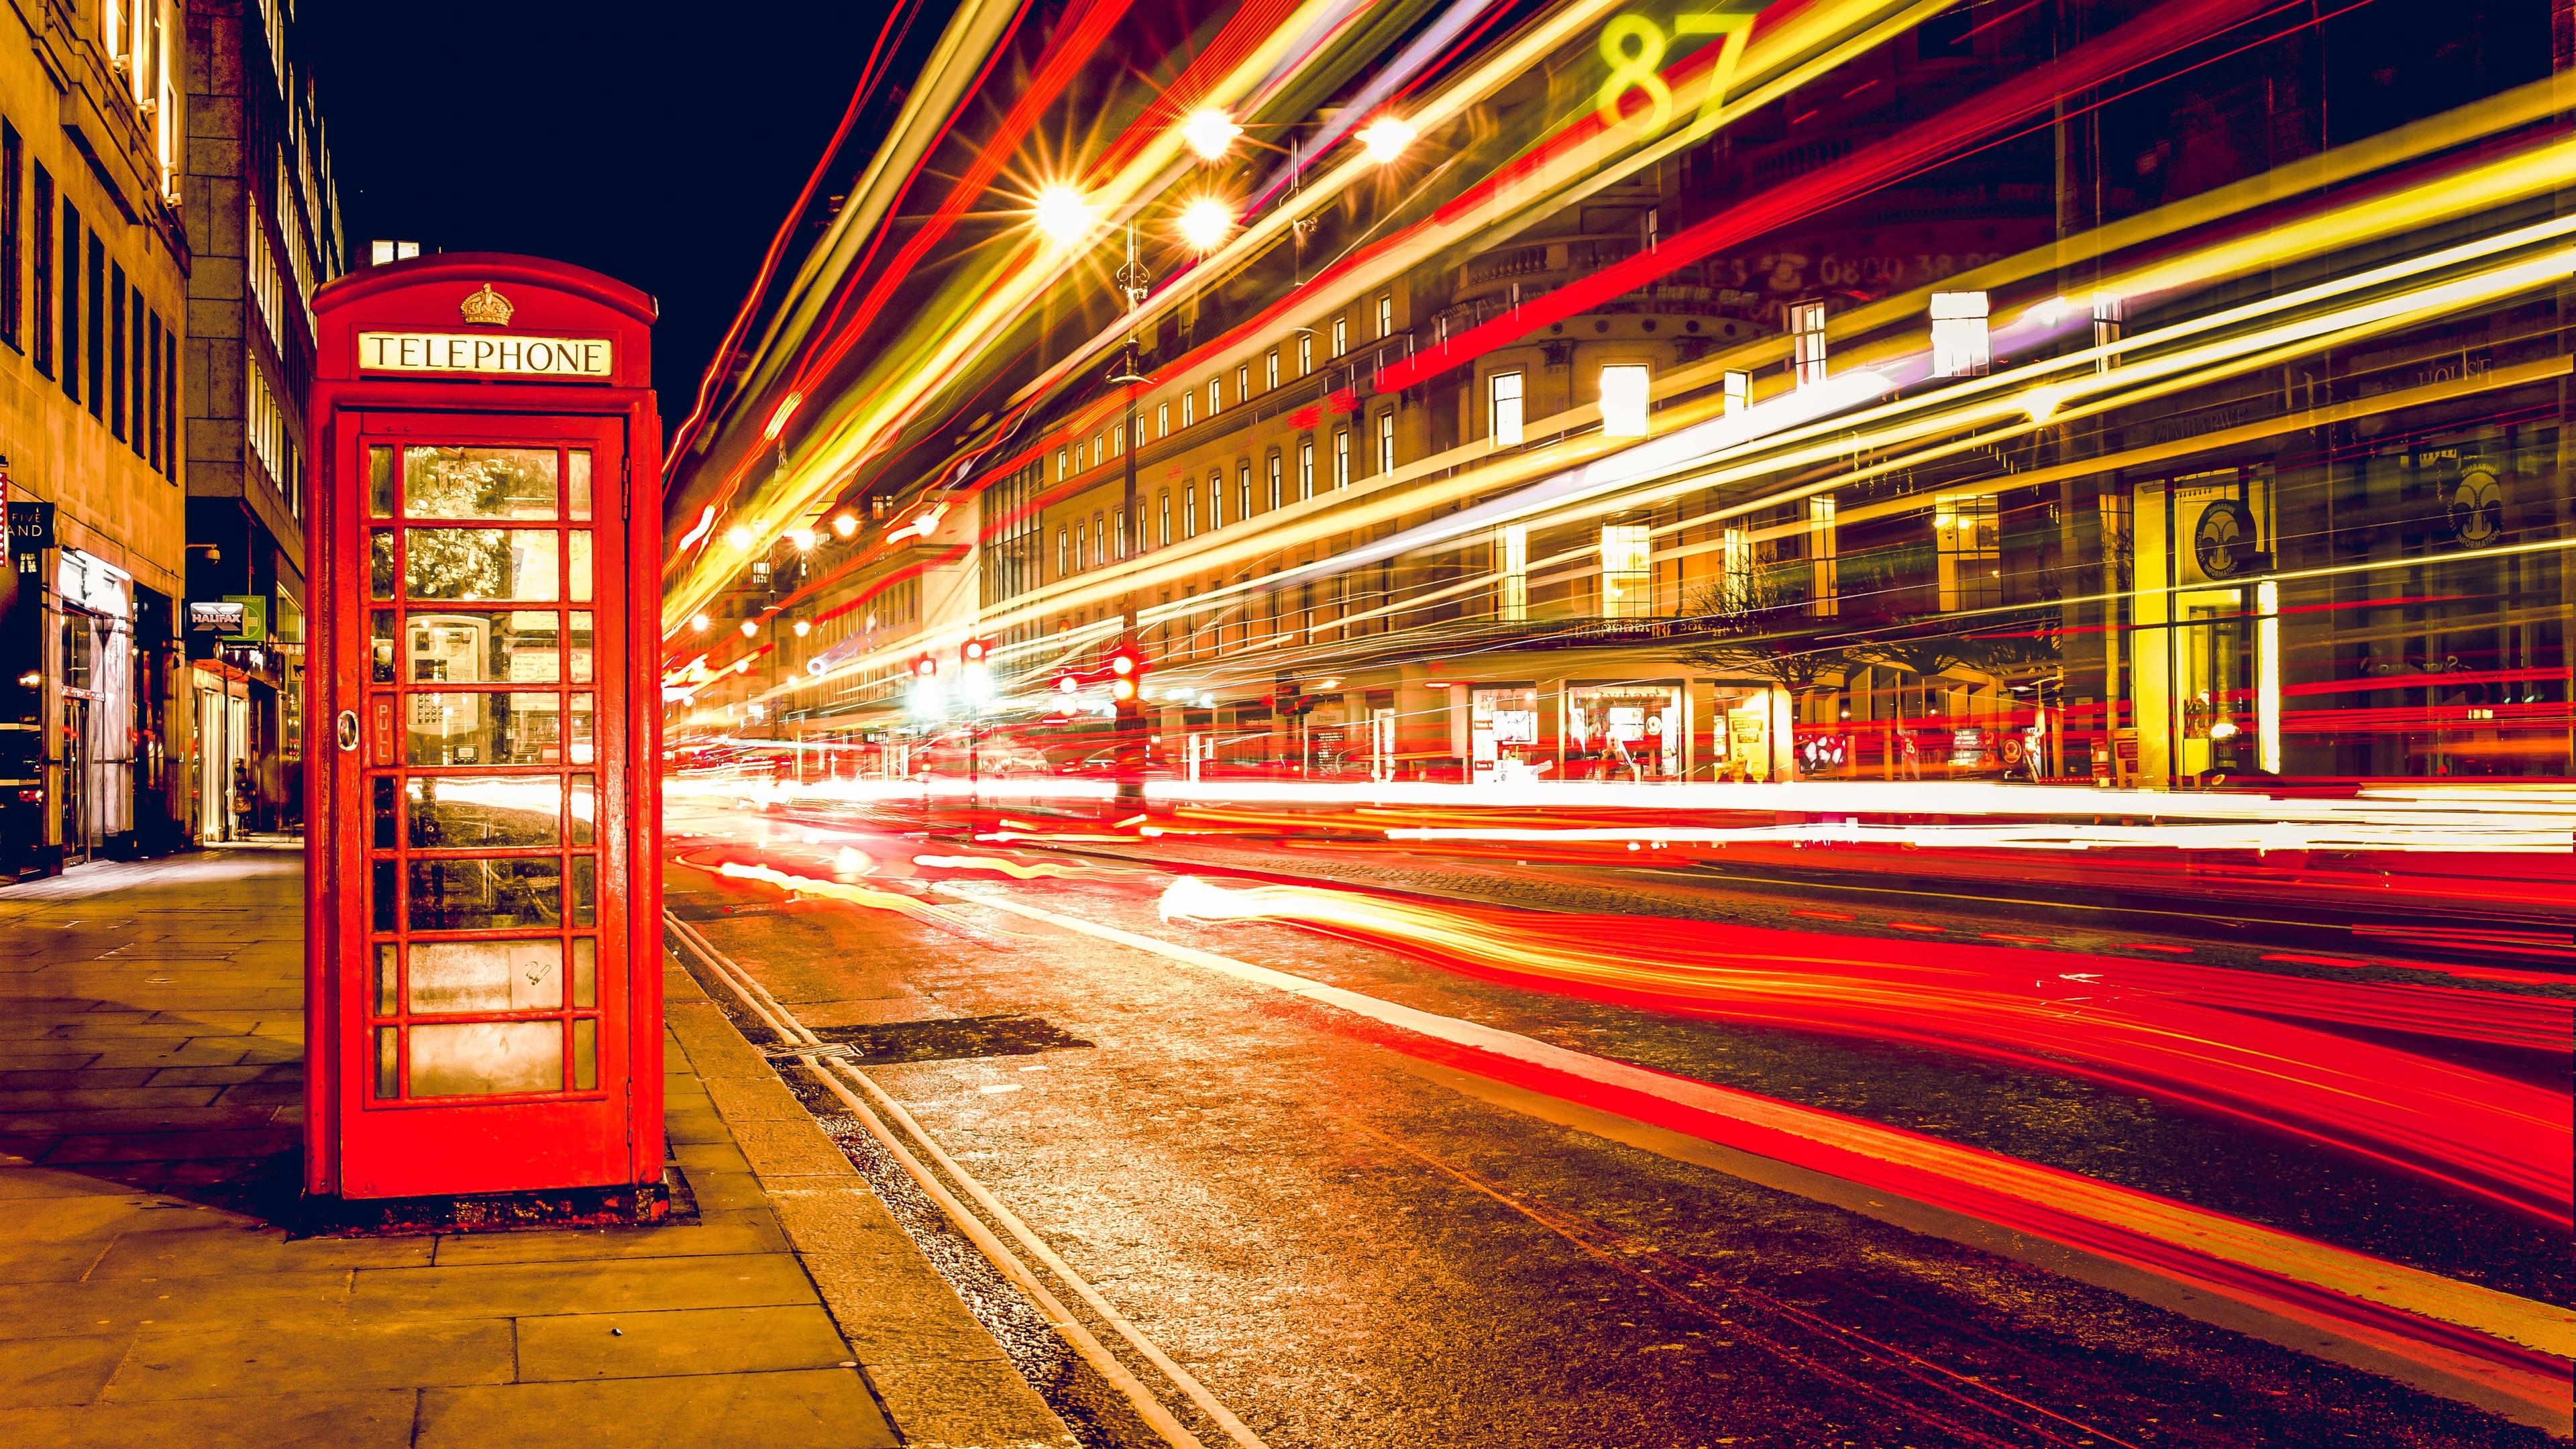 Wallpaper London England Telephone Booth Street Nights